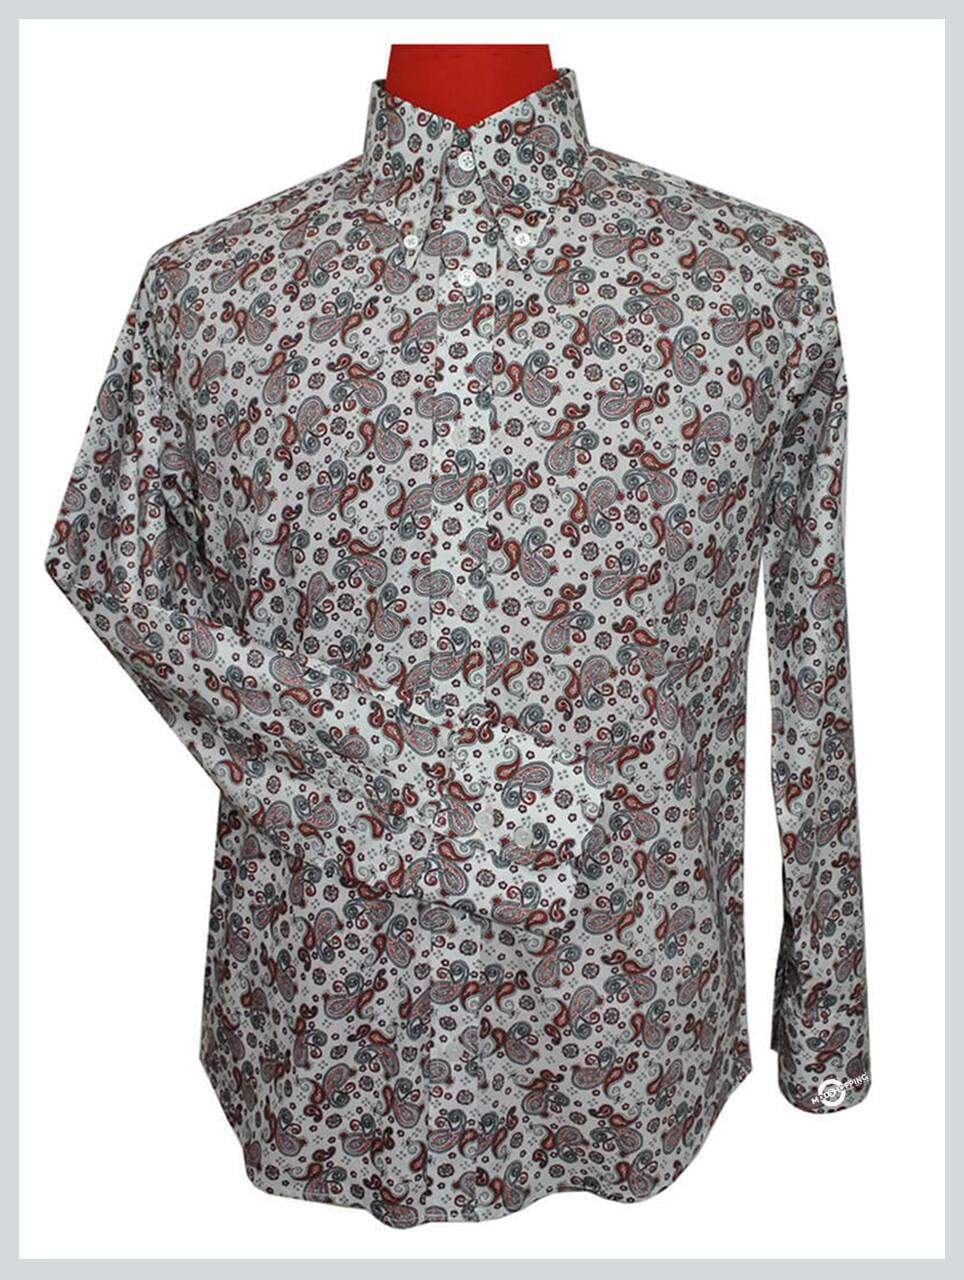 Brown Paisley Shirt| Longsleeve 60s Mod Style Mens Paisley Shirt